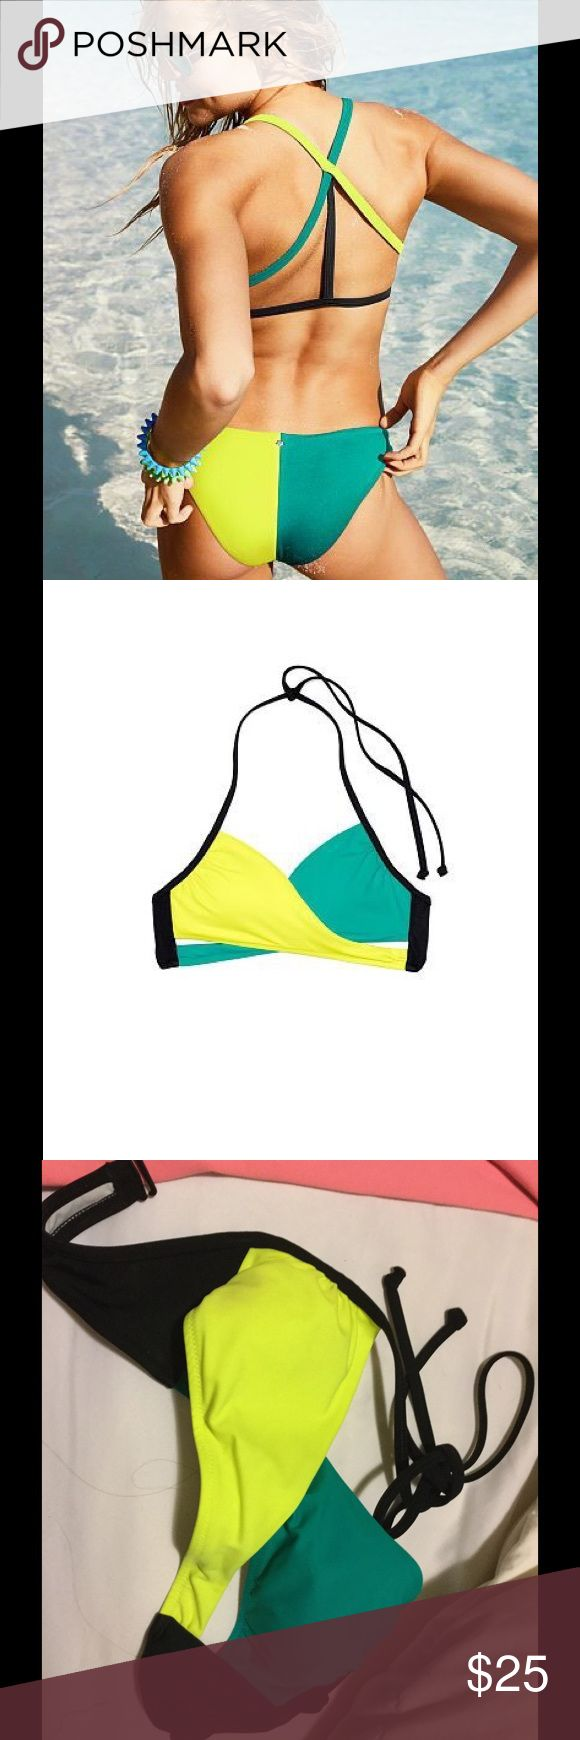 Victoria secret PINK bikinis Cute colorblock bikini. Both top and bottom are XS in size. PINK Victoria's Secret Swim Bikinis